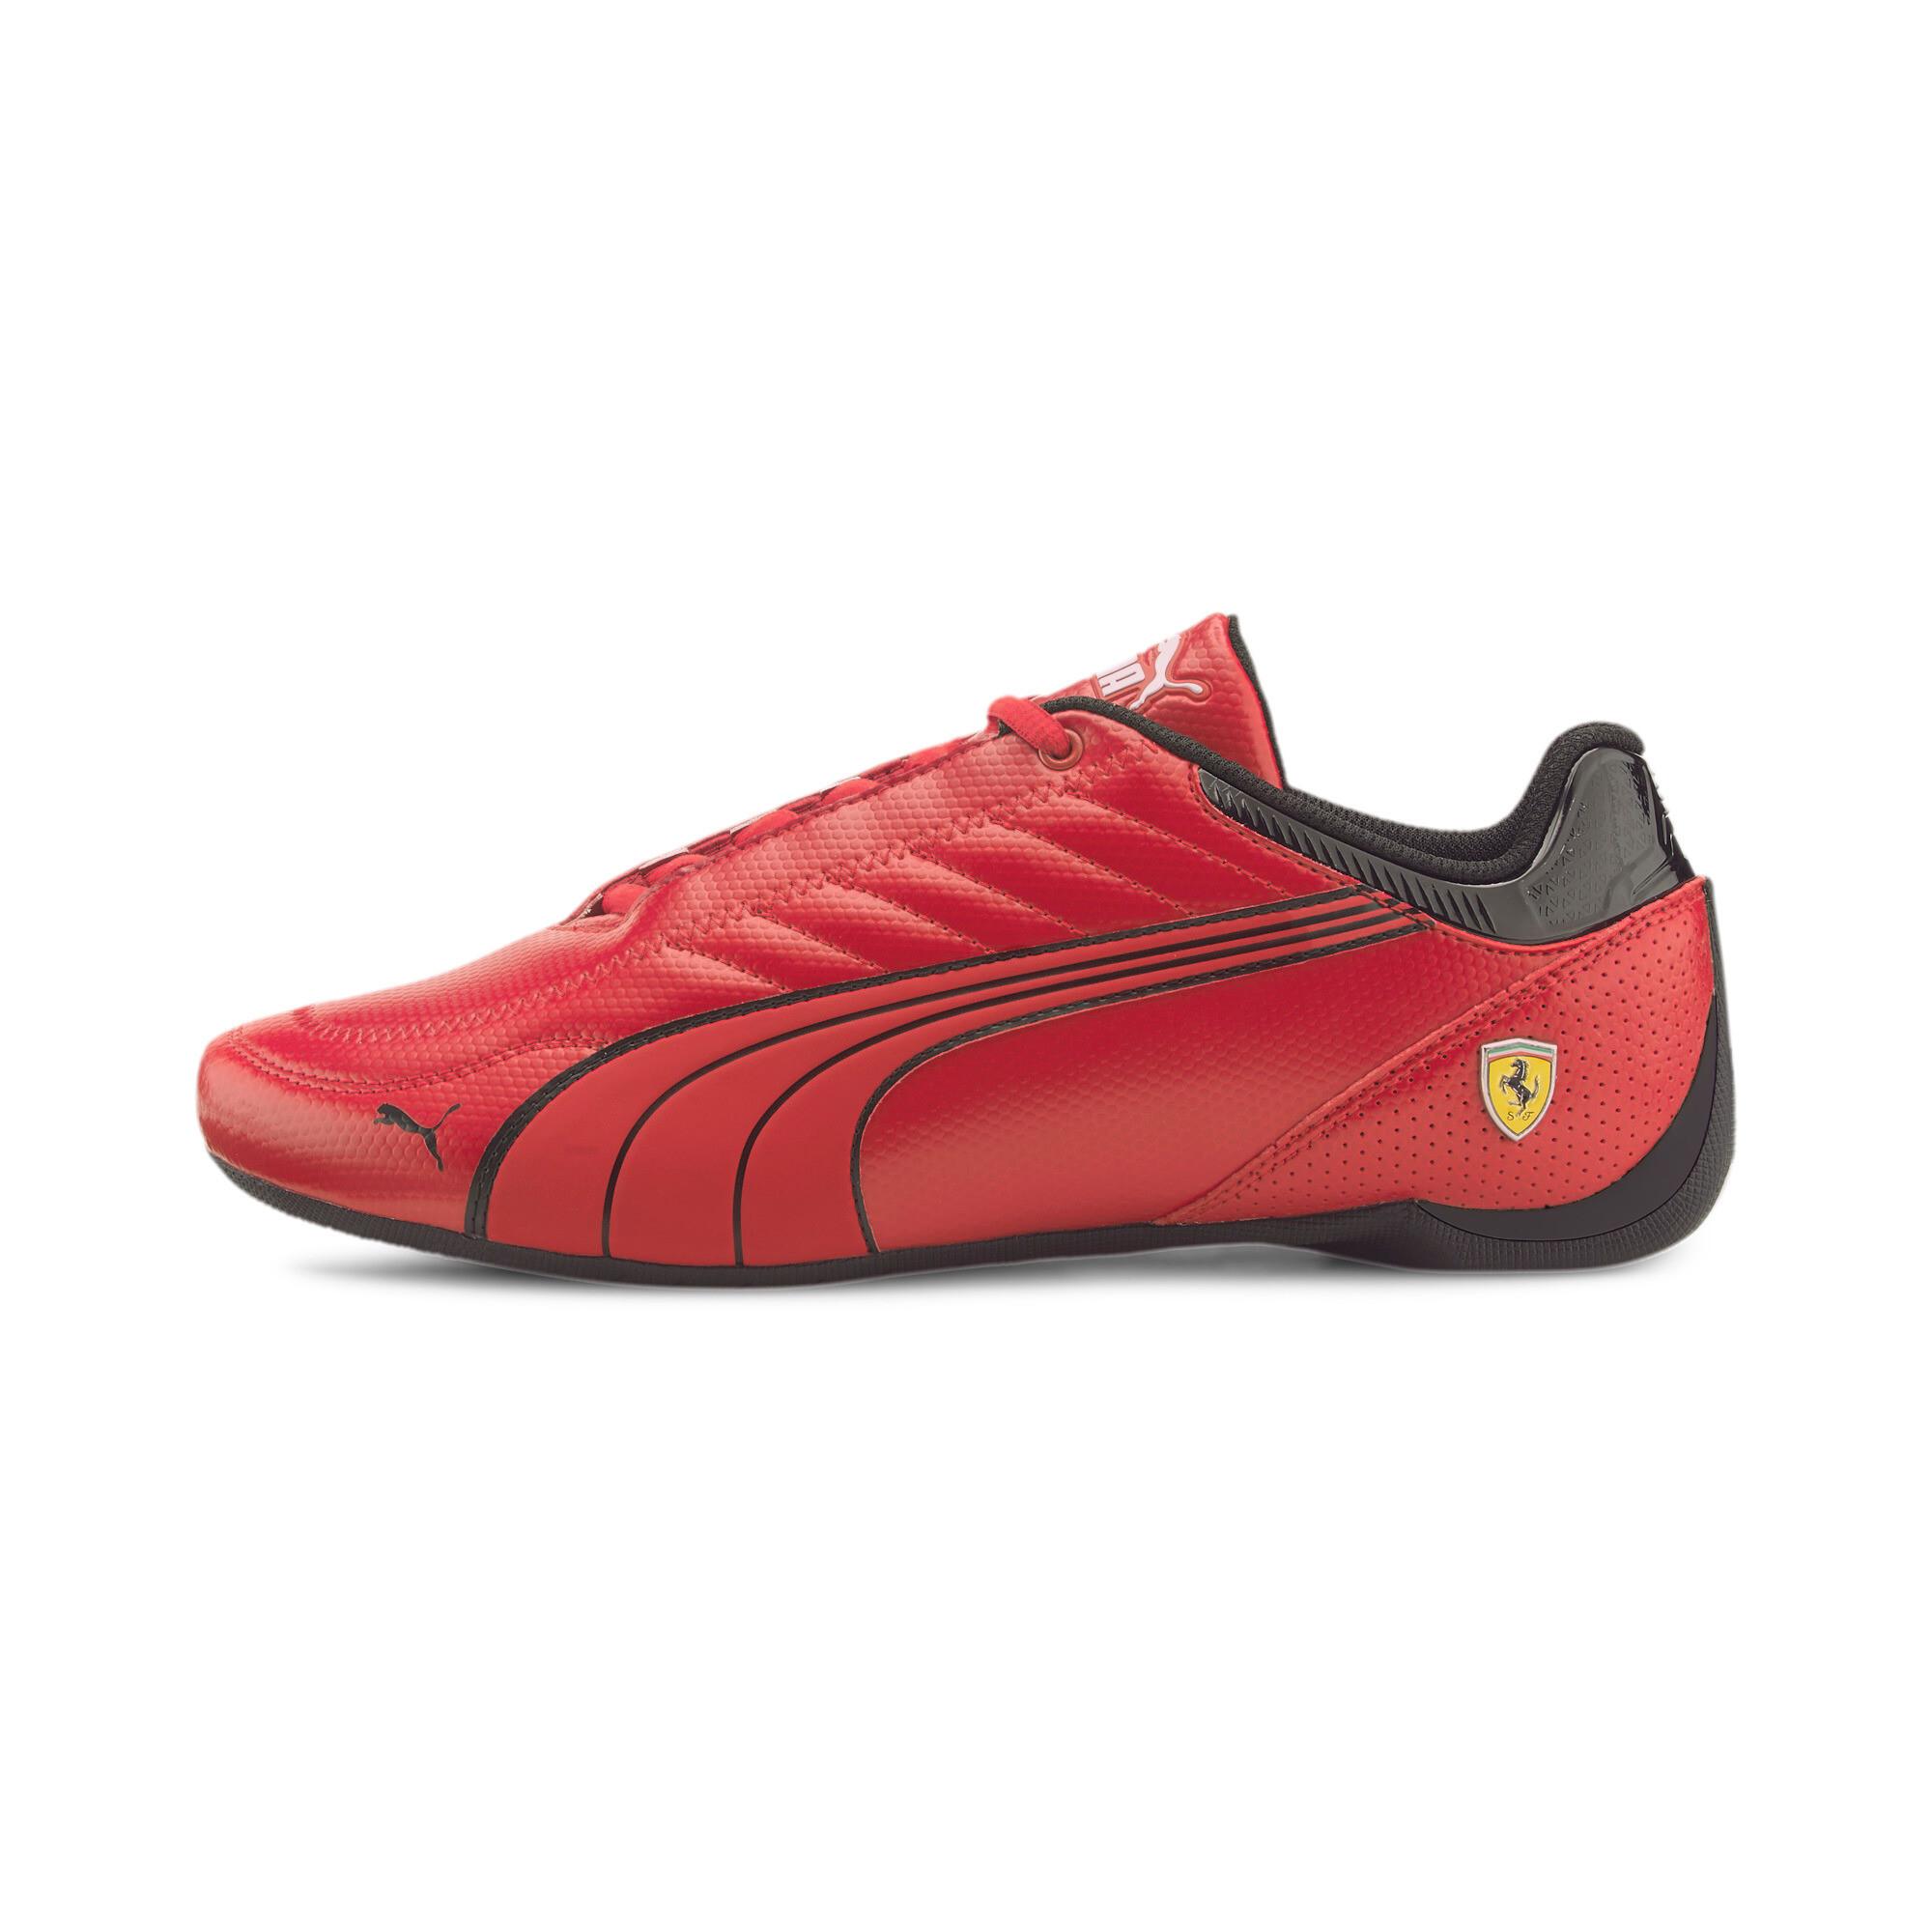 thumbnail 7 - Puma Men's Scuderia Ferrari Race Future Kart Cat Motorsport Shoes